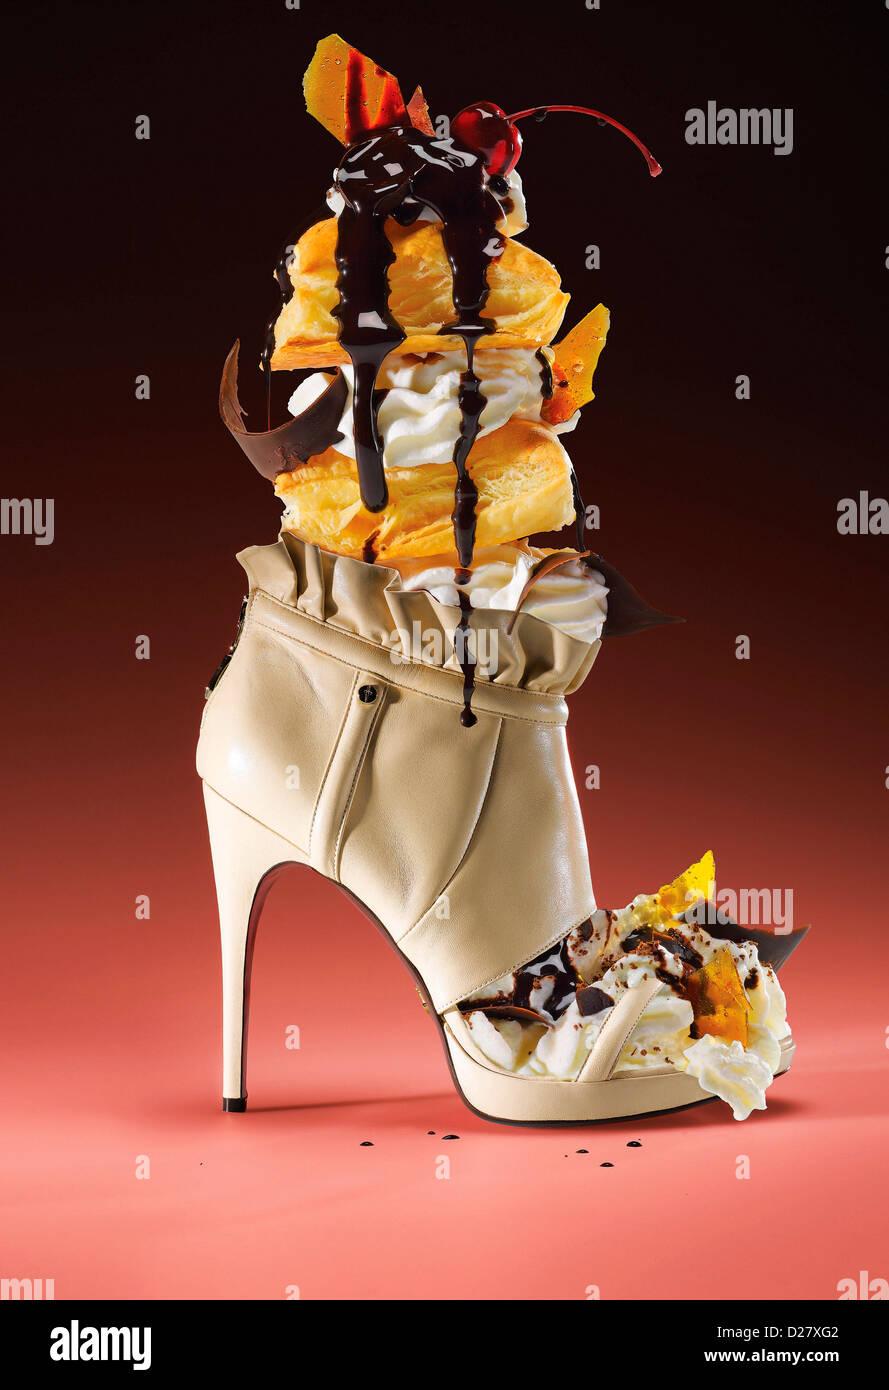 High Heel Shoe Filled With Ice Cream Sundae on Pink Background - Stock Image